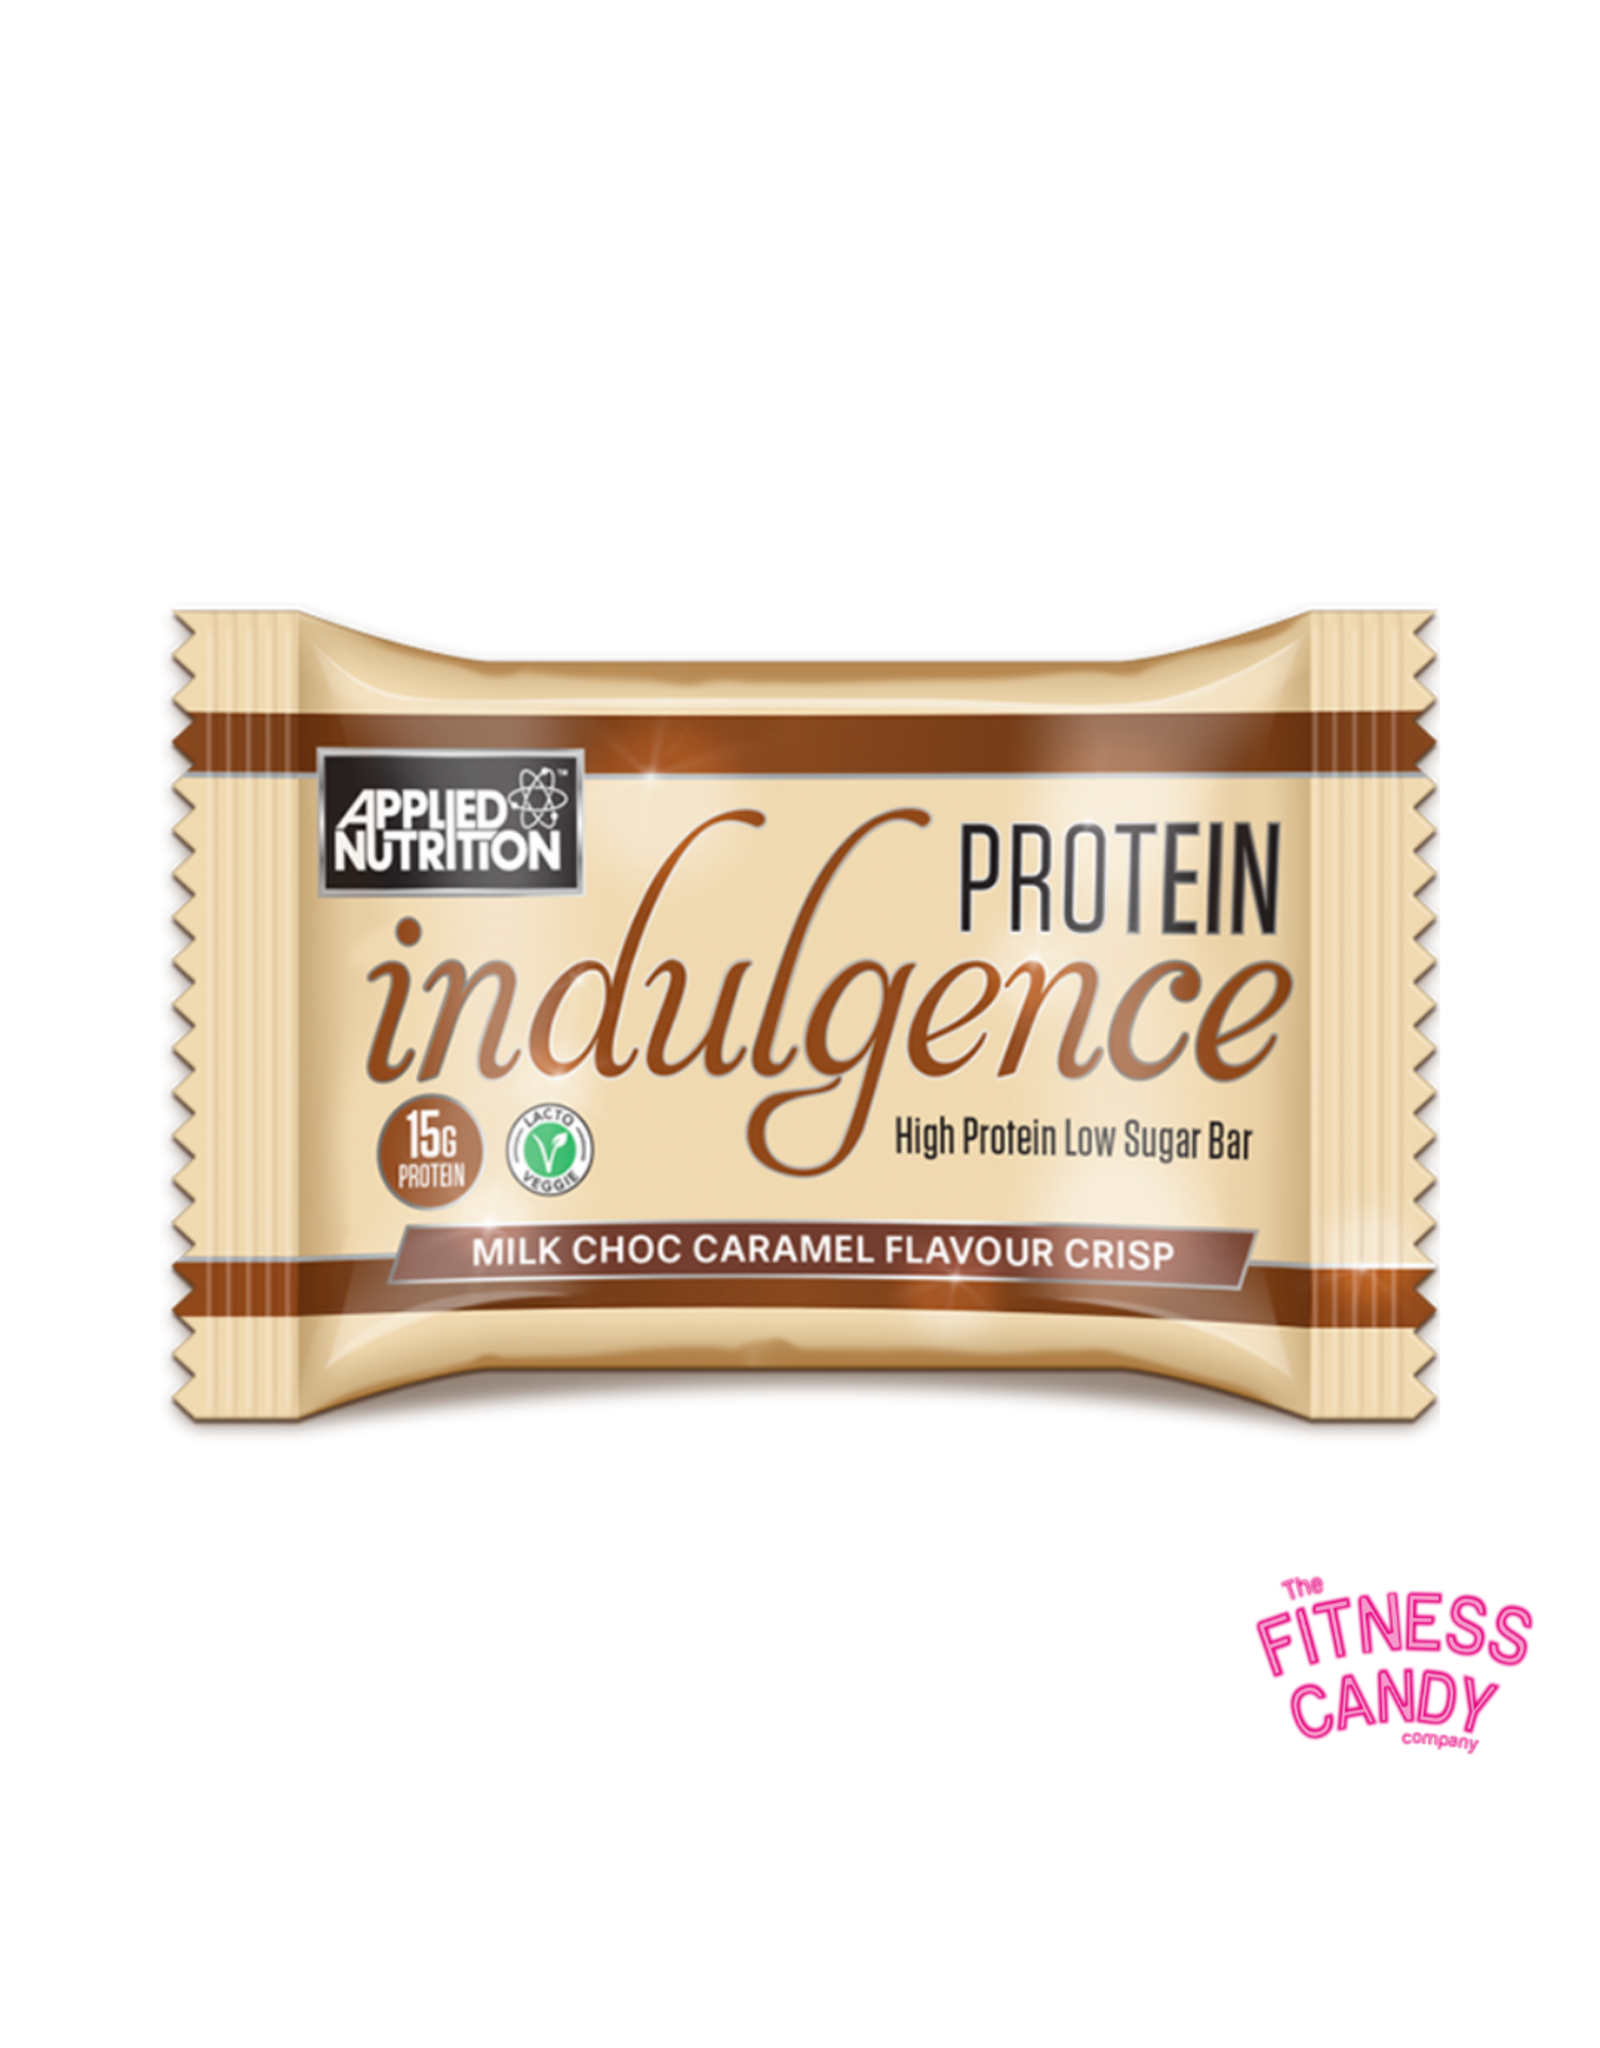 APPLIED NUTRITION INDULGENCE Milk Chocolate Caramel